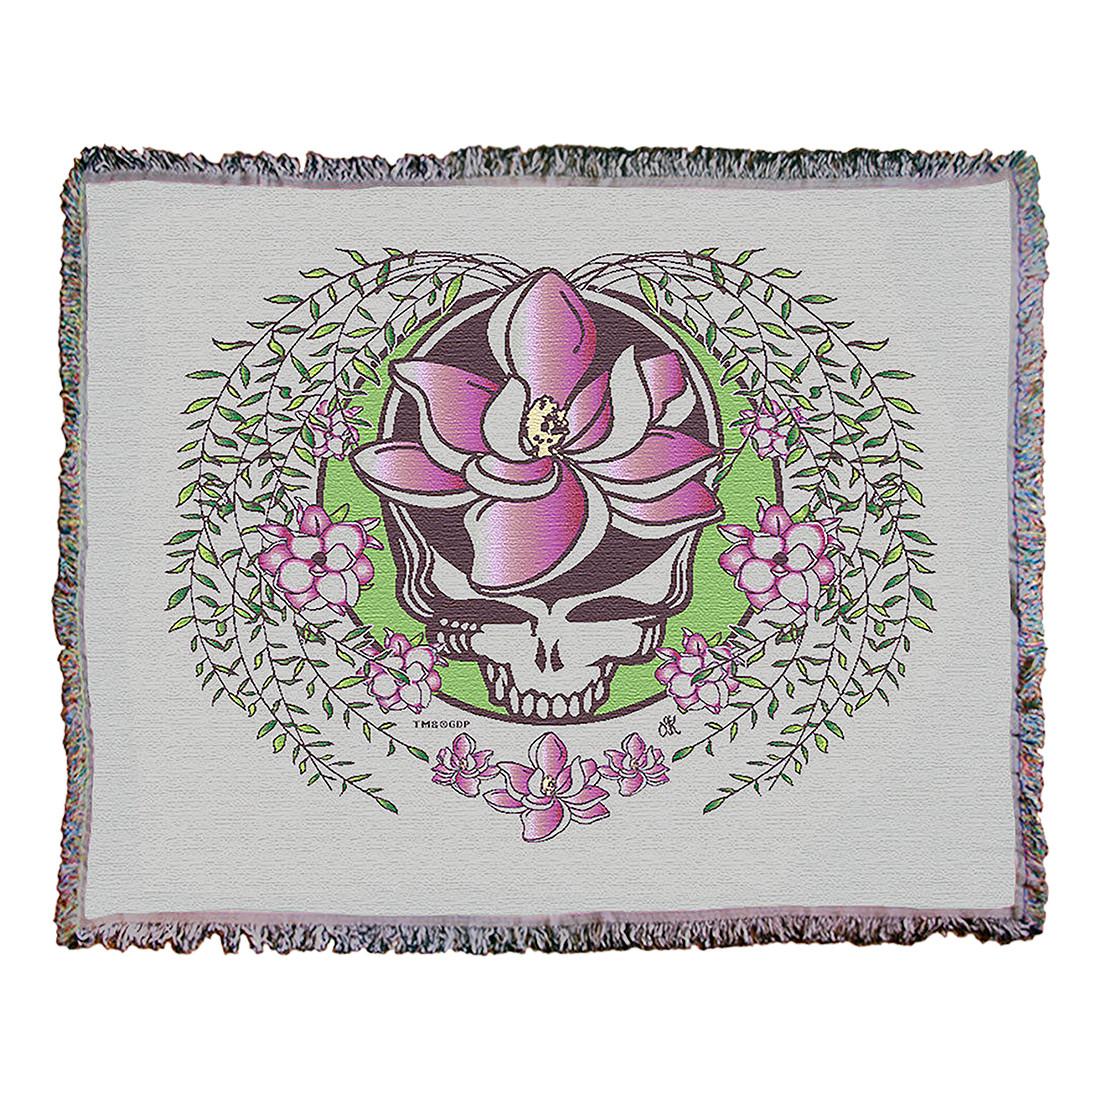 GD Sugar Magnolia SYF Cream Woven Blanket